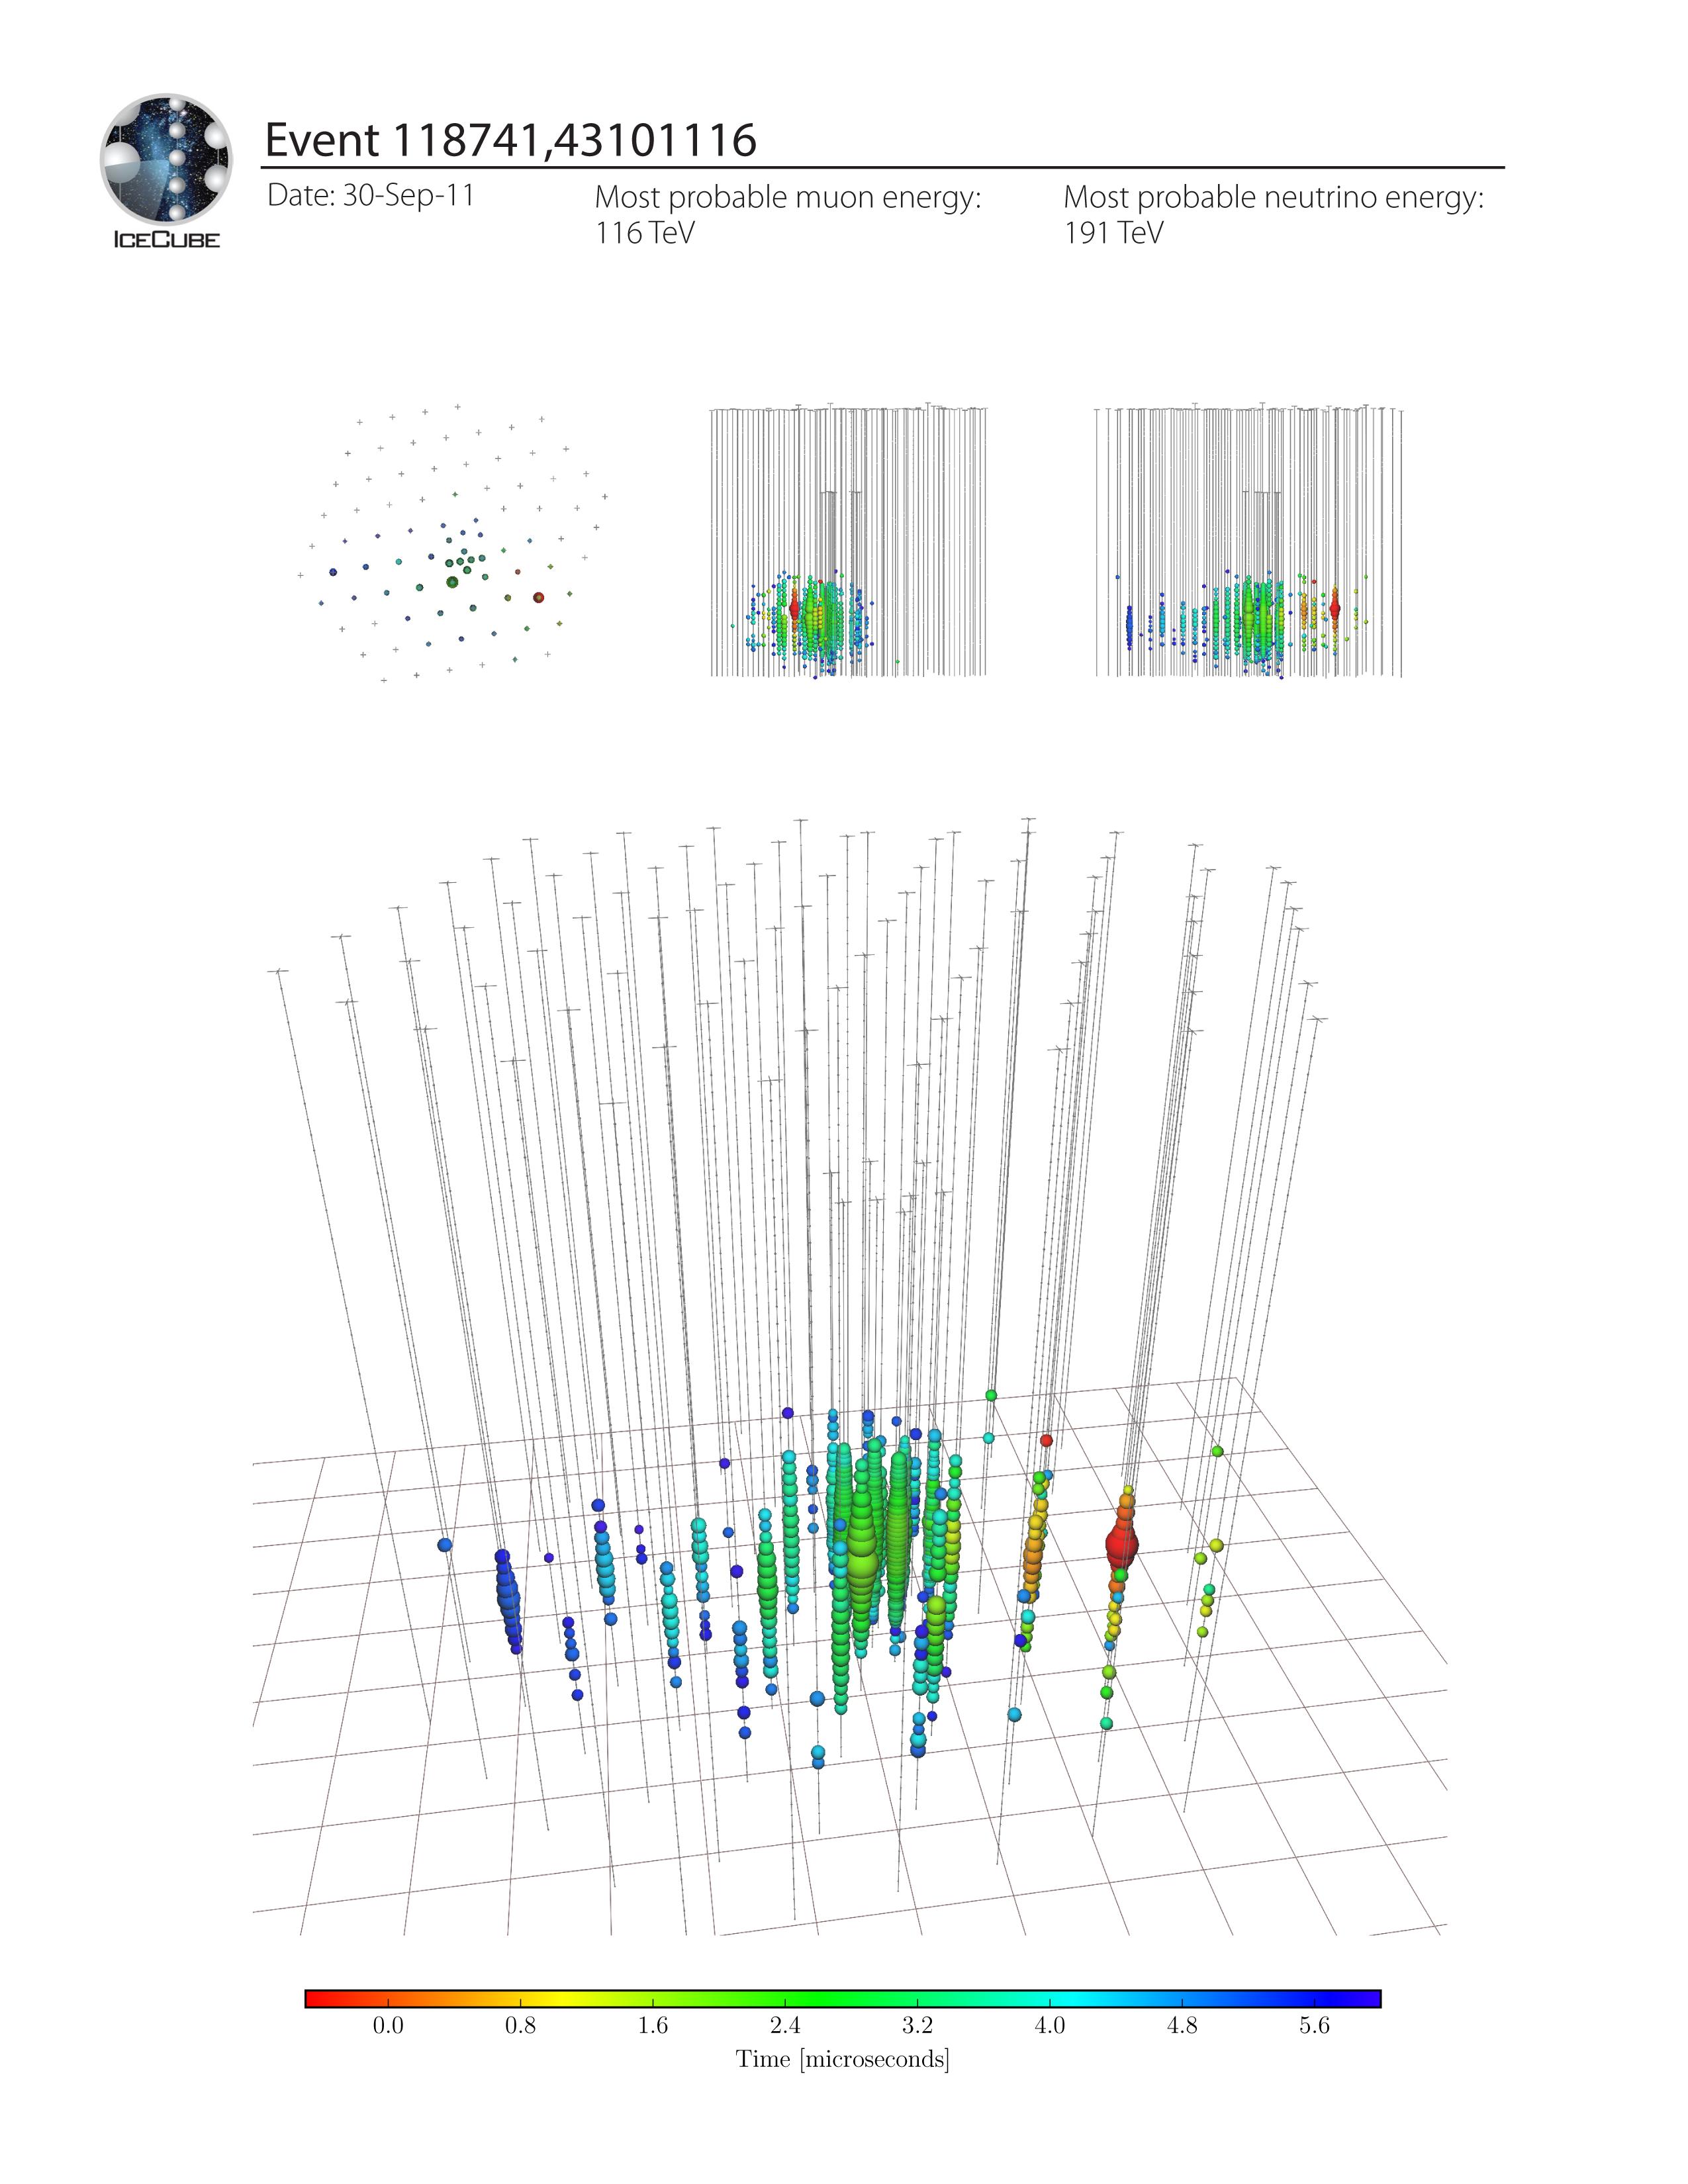 IceCube Event ID 118741,43101116. Most probable neutrino energy: 191 TeV, September 30, 2011